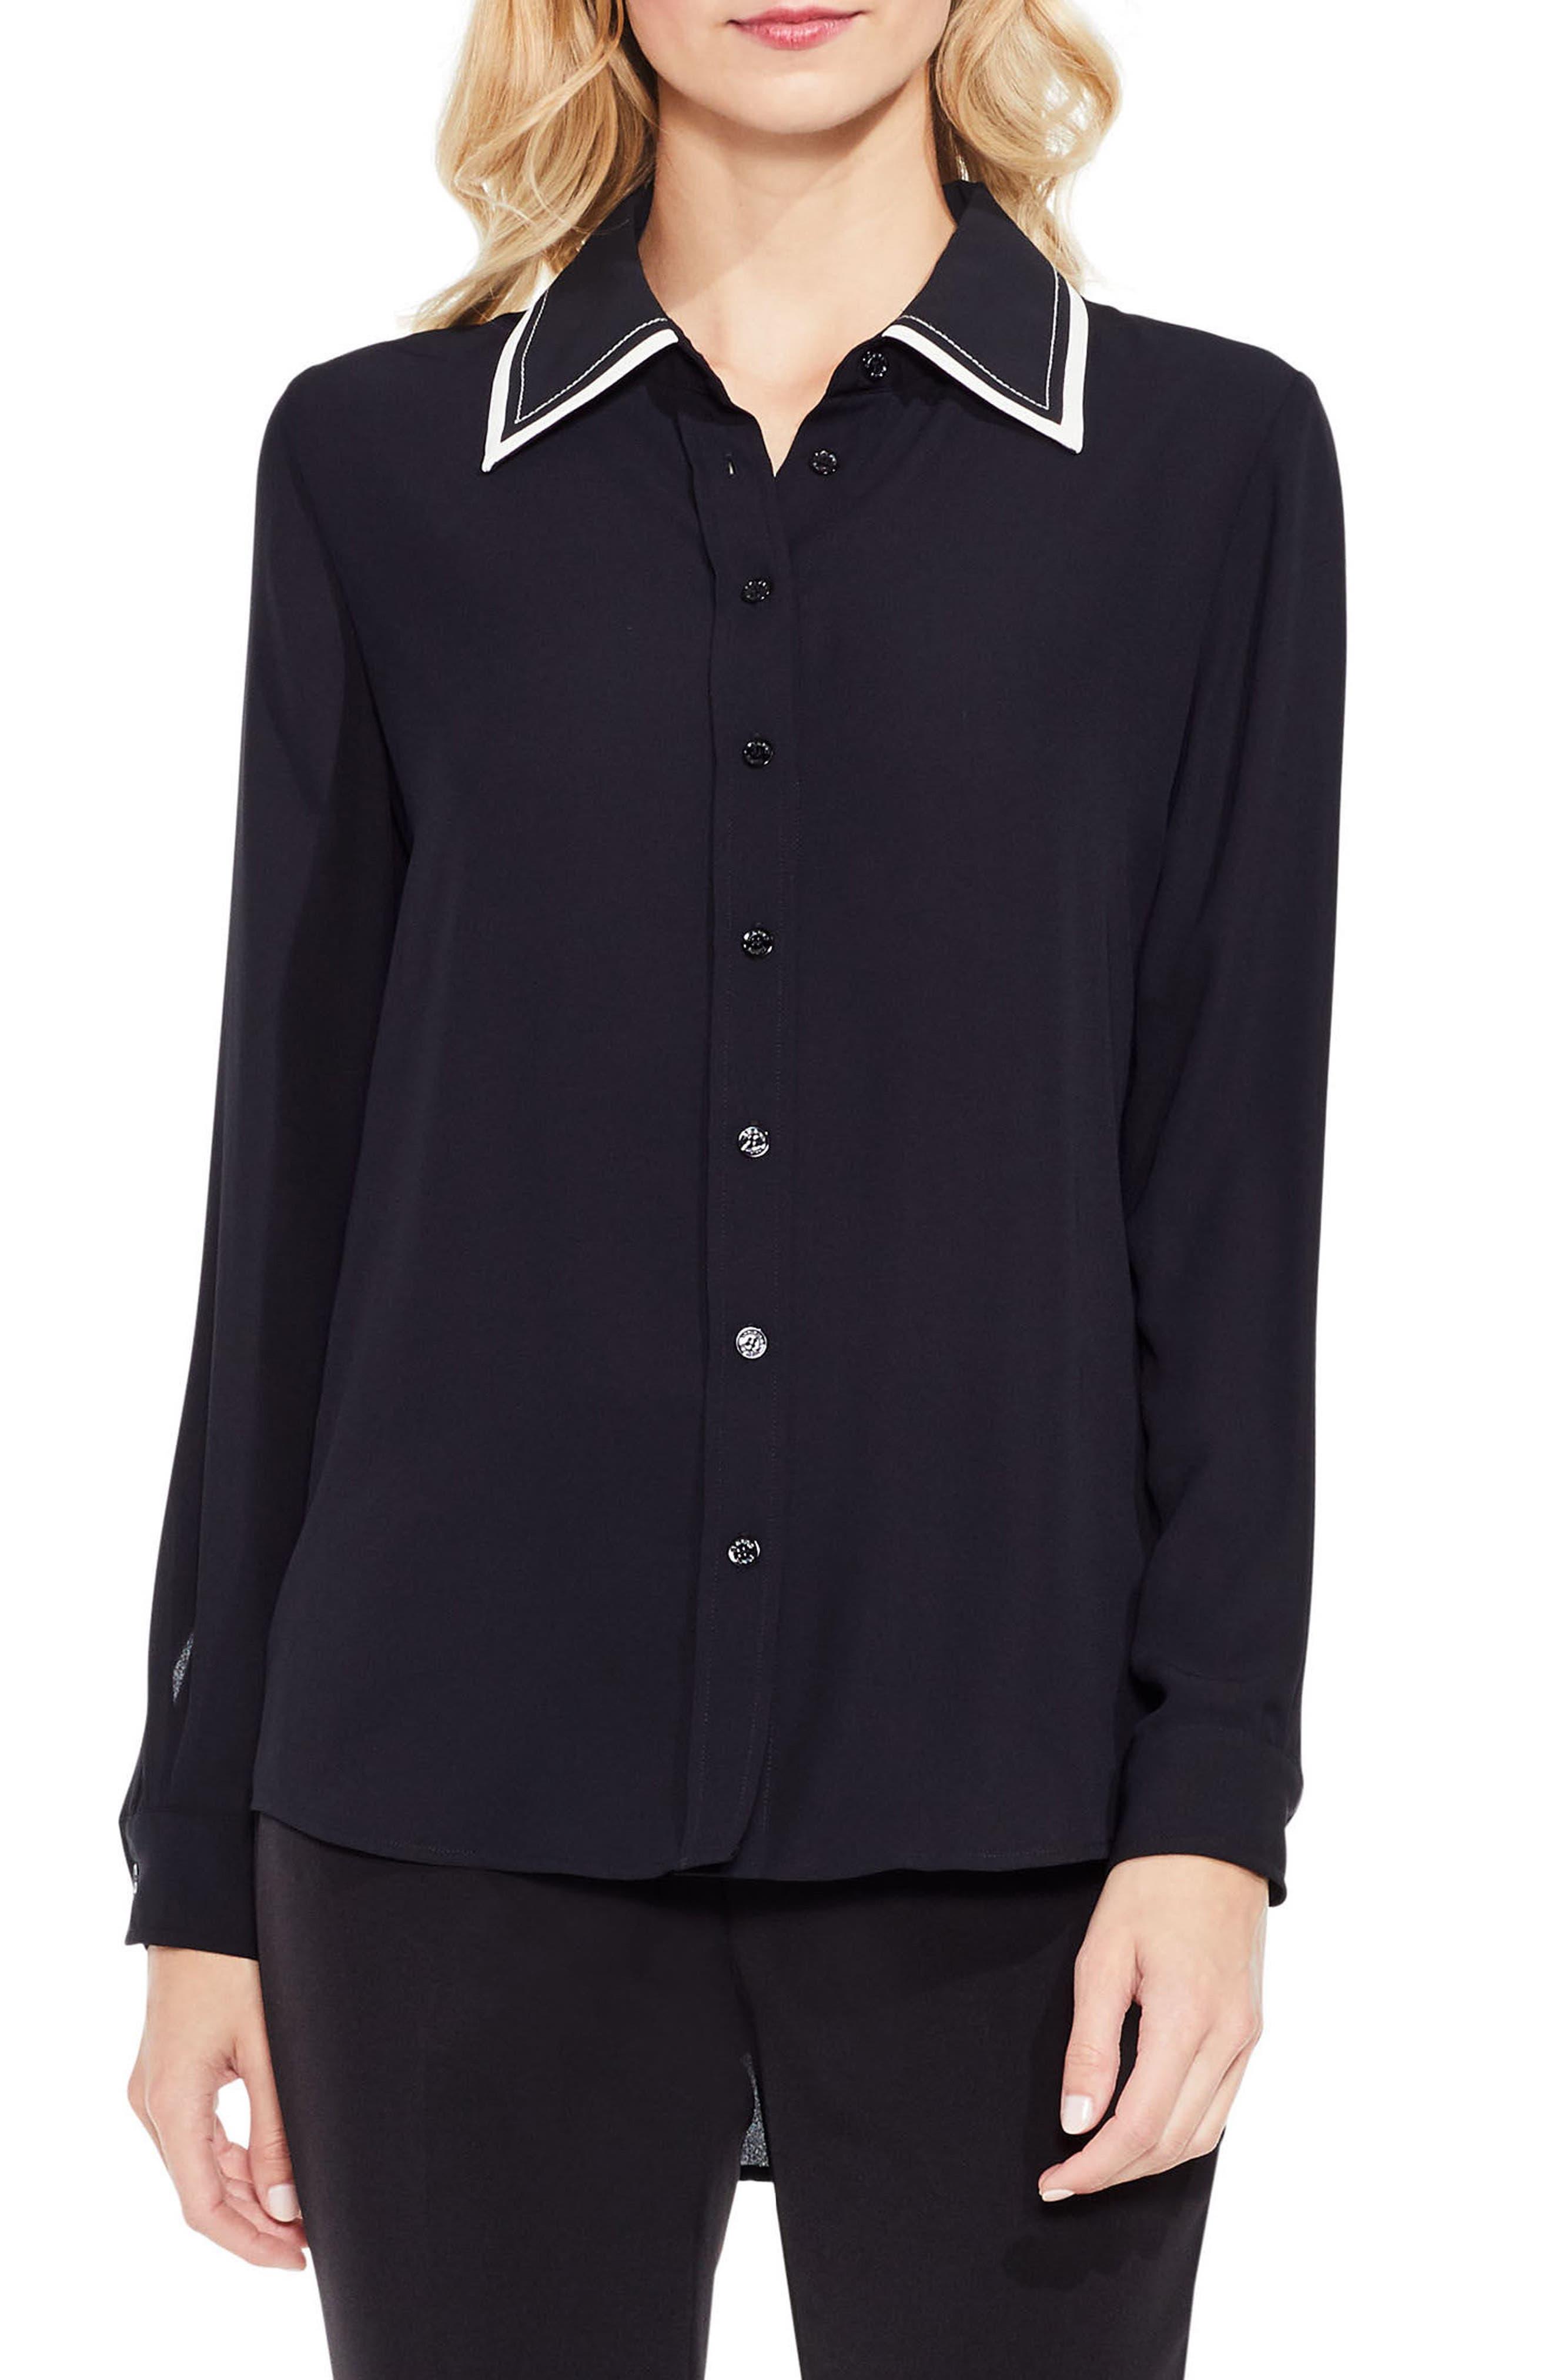 Long Sleeve Button Down Blouse,                             Main thumbnail 1, color,                             Rich Black